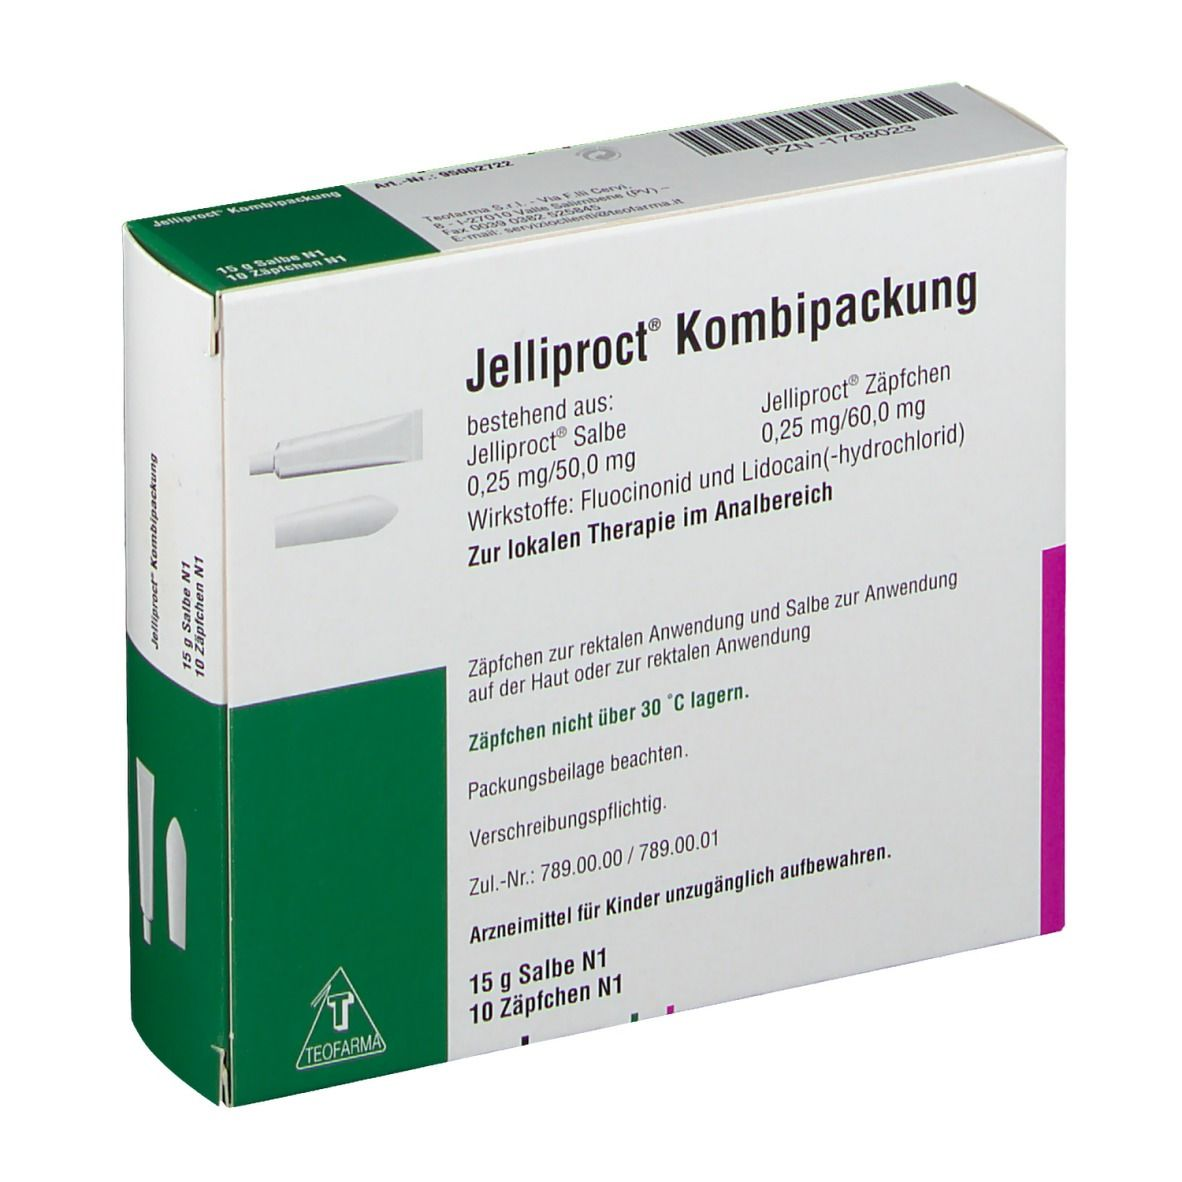 Jelliproct Kombipackung Salbe 15g+Zaepfchen